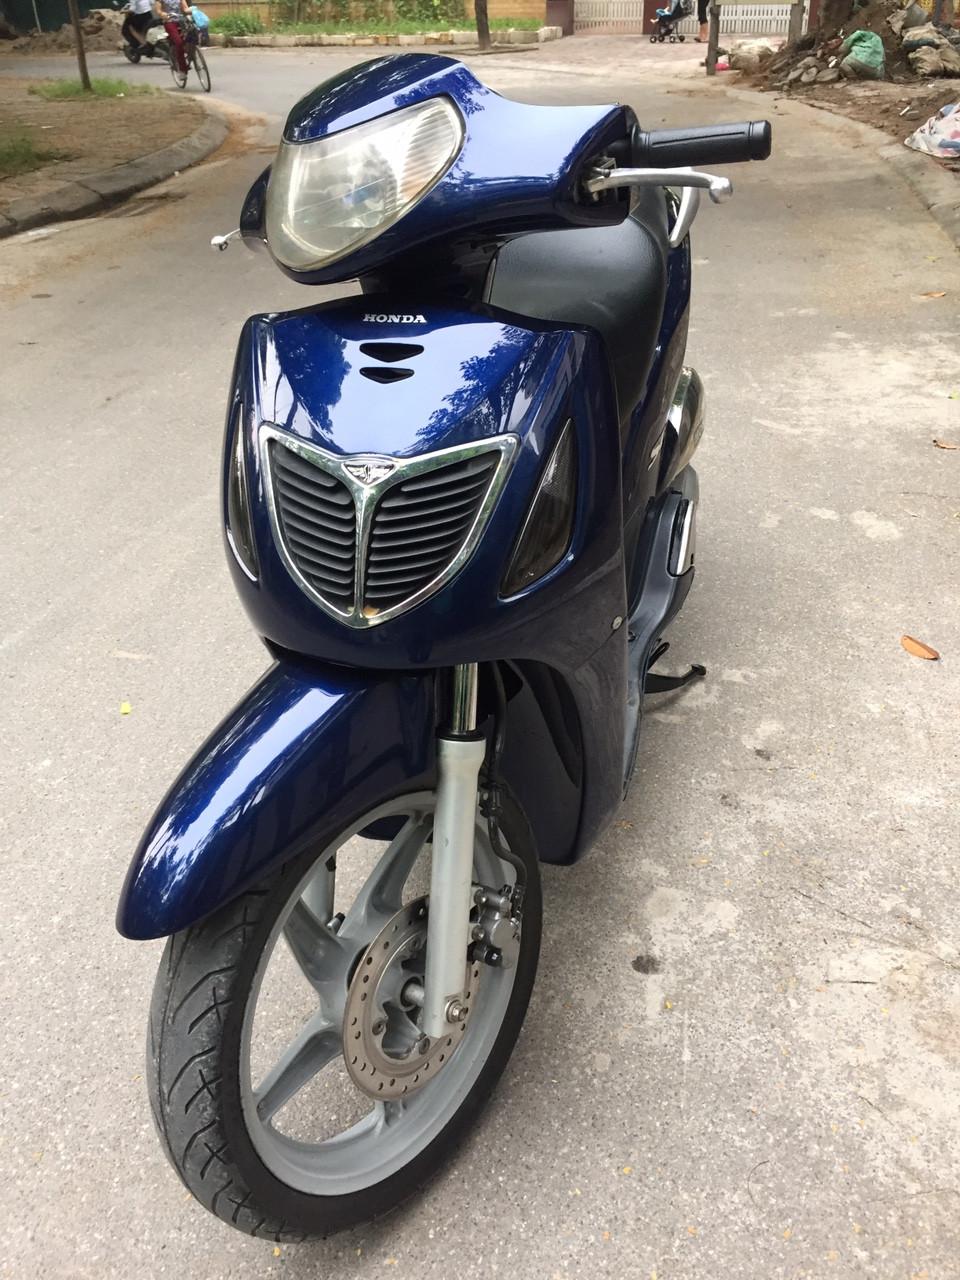 Can ban Honda Sh 150 che thuong xanh tim bien Hn 29U may nguyen thuy 305tr - 5